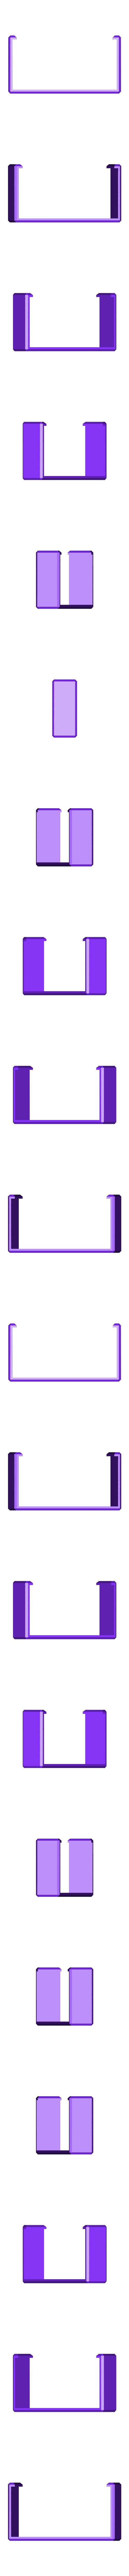 Uchwyt_C.stl Download free STL file Ikea Lack connecting/stacking handles • 3D printer template, kpawel